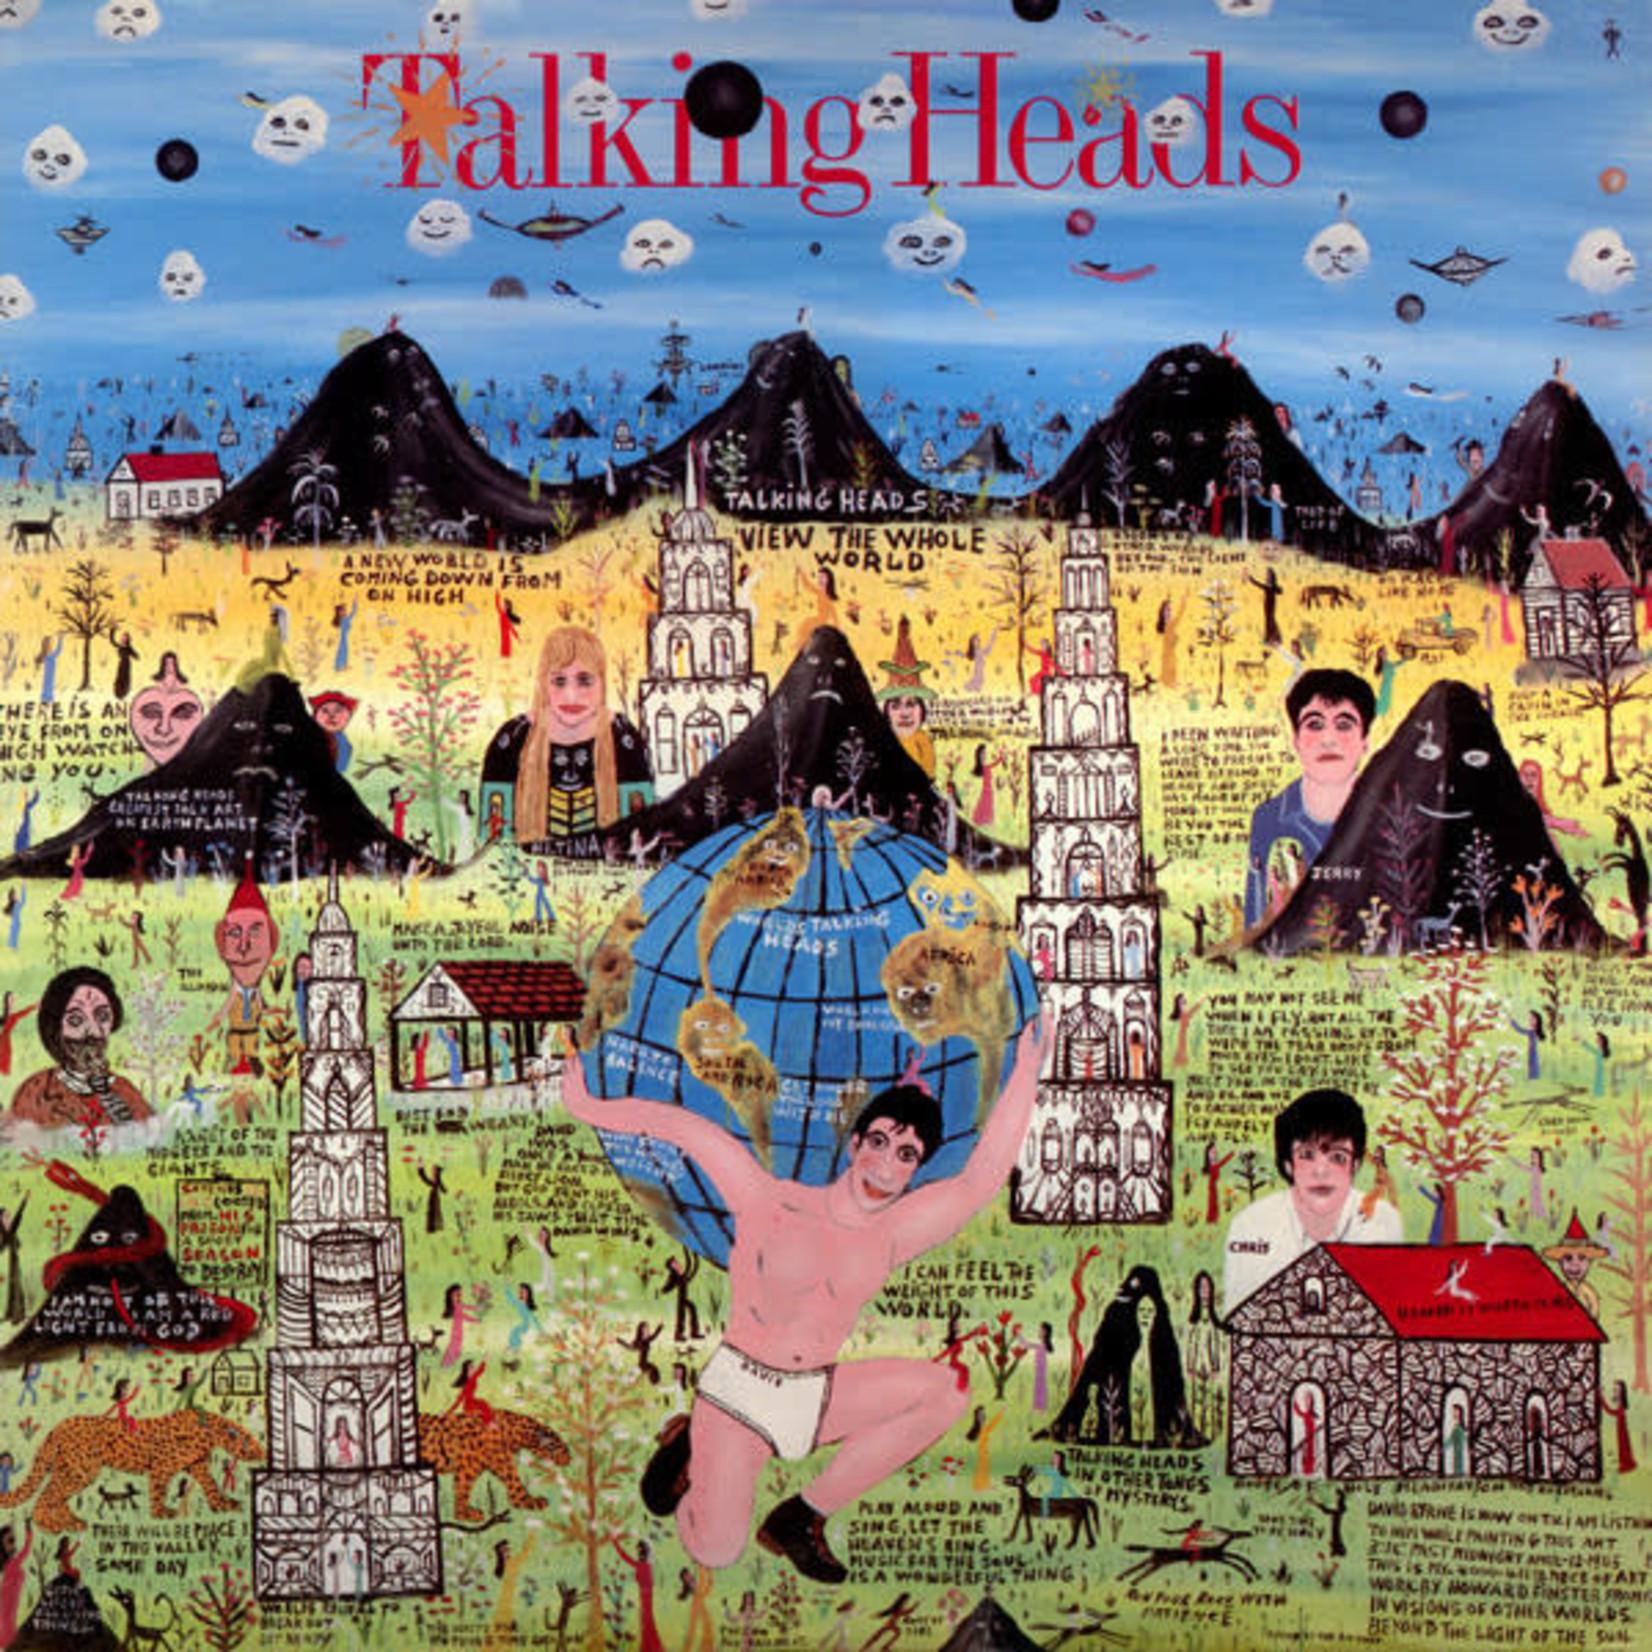 [Vintage] Talking Heads: Little Creatures